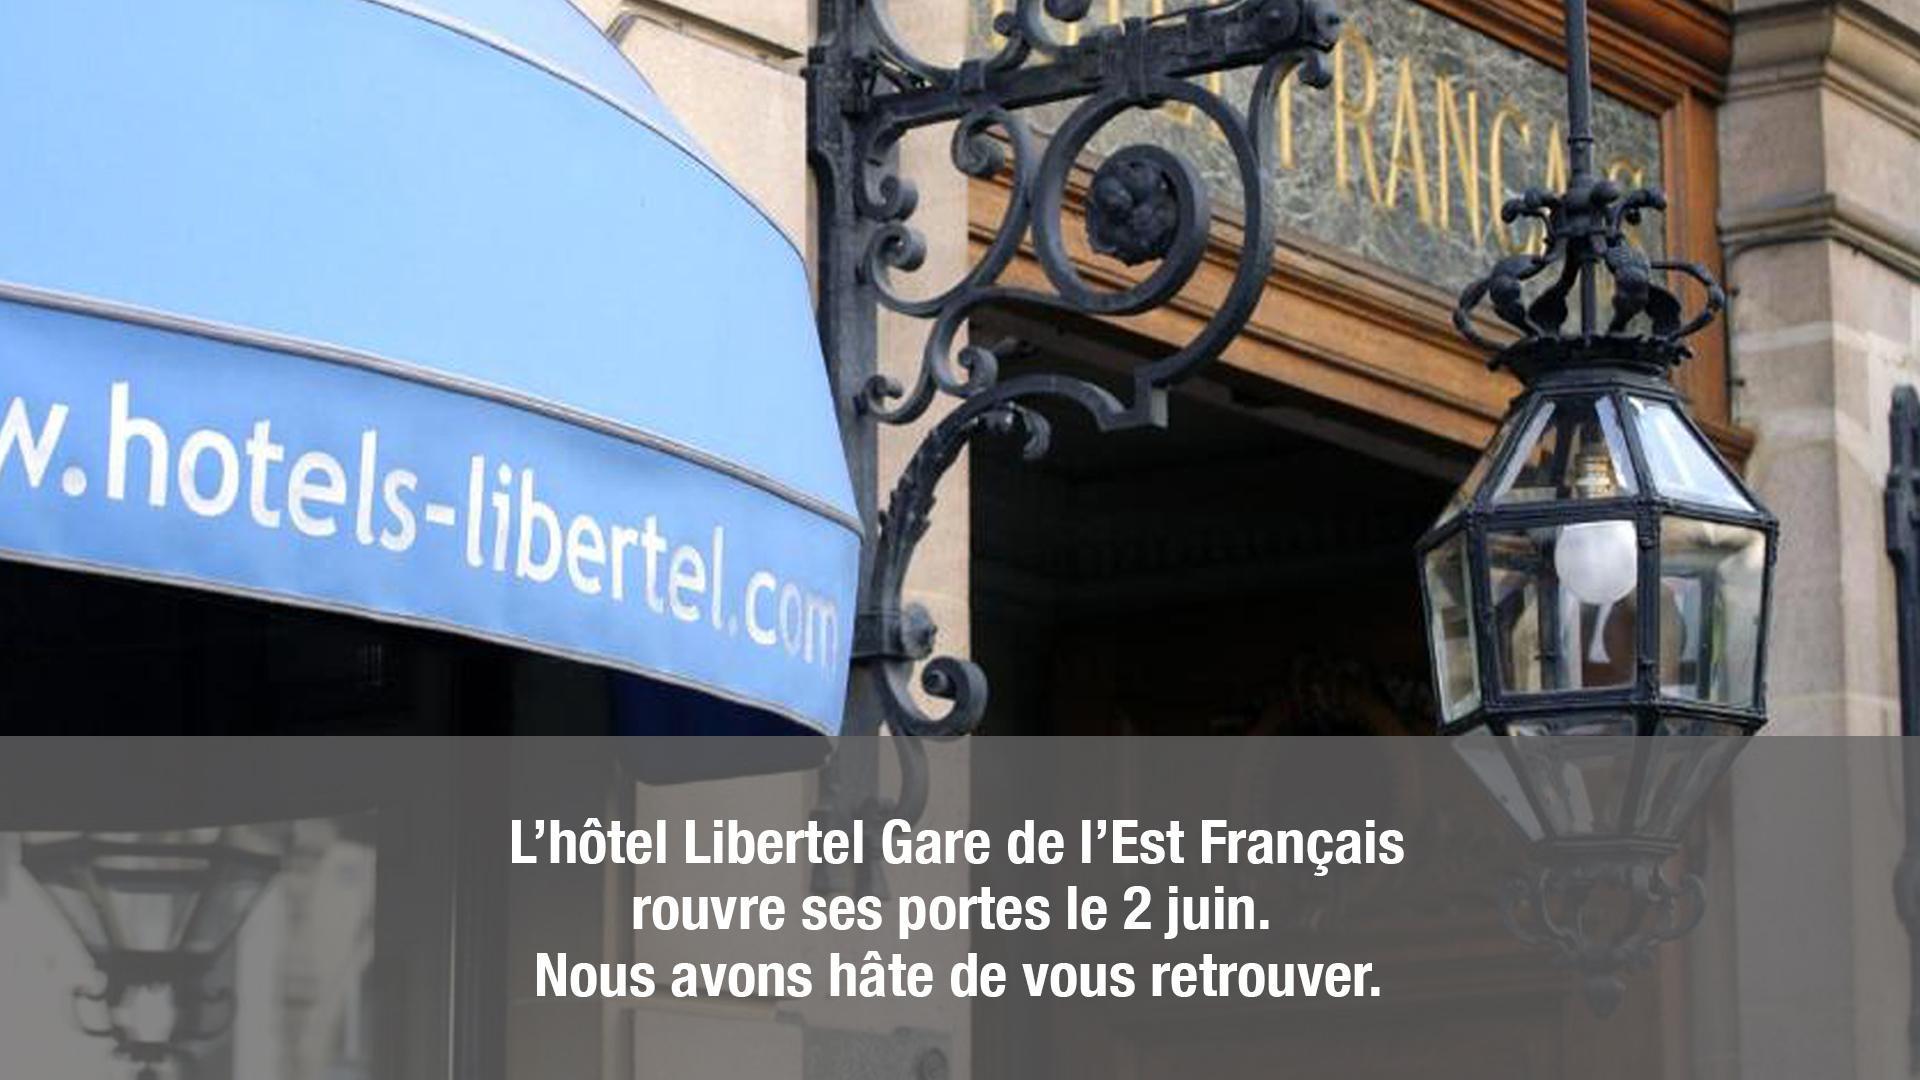 Hotel Libertel Gare de l'Est Francais